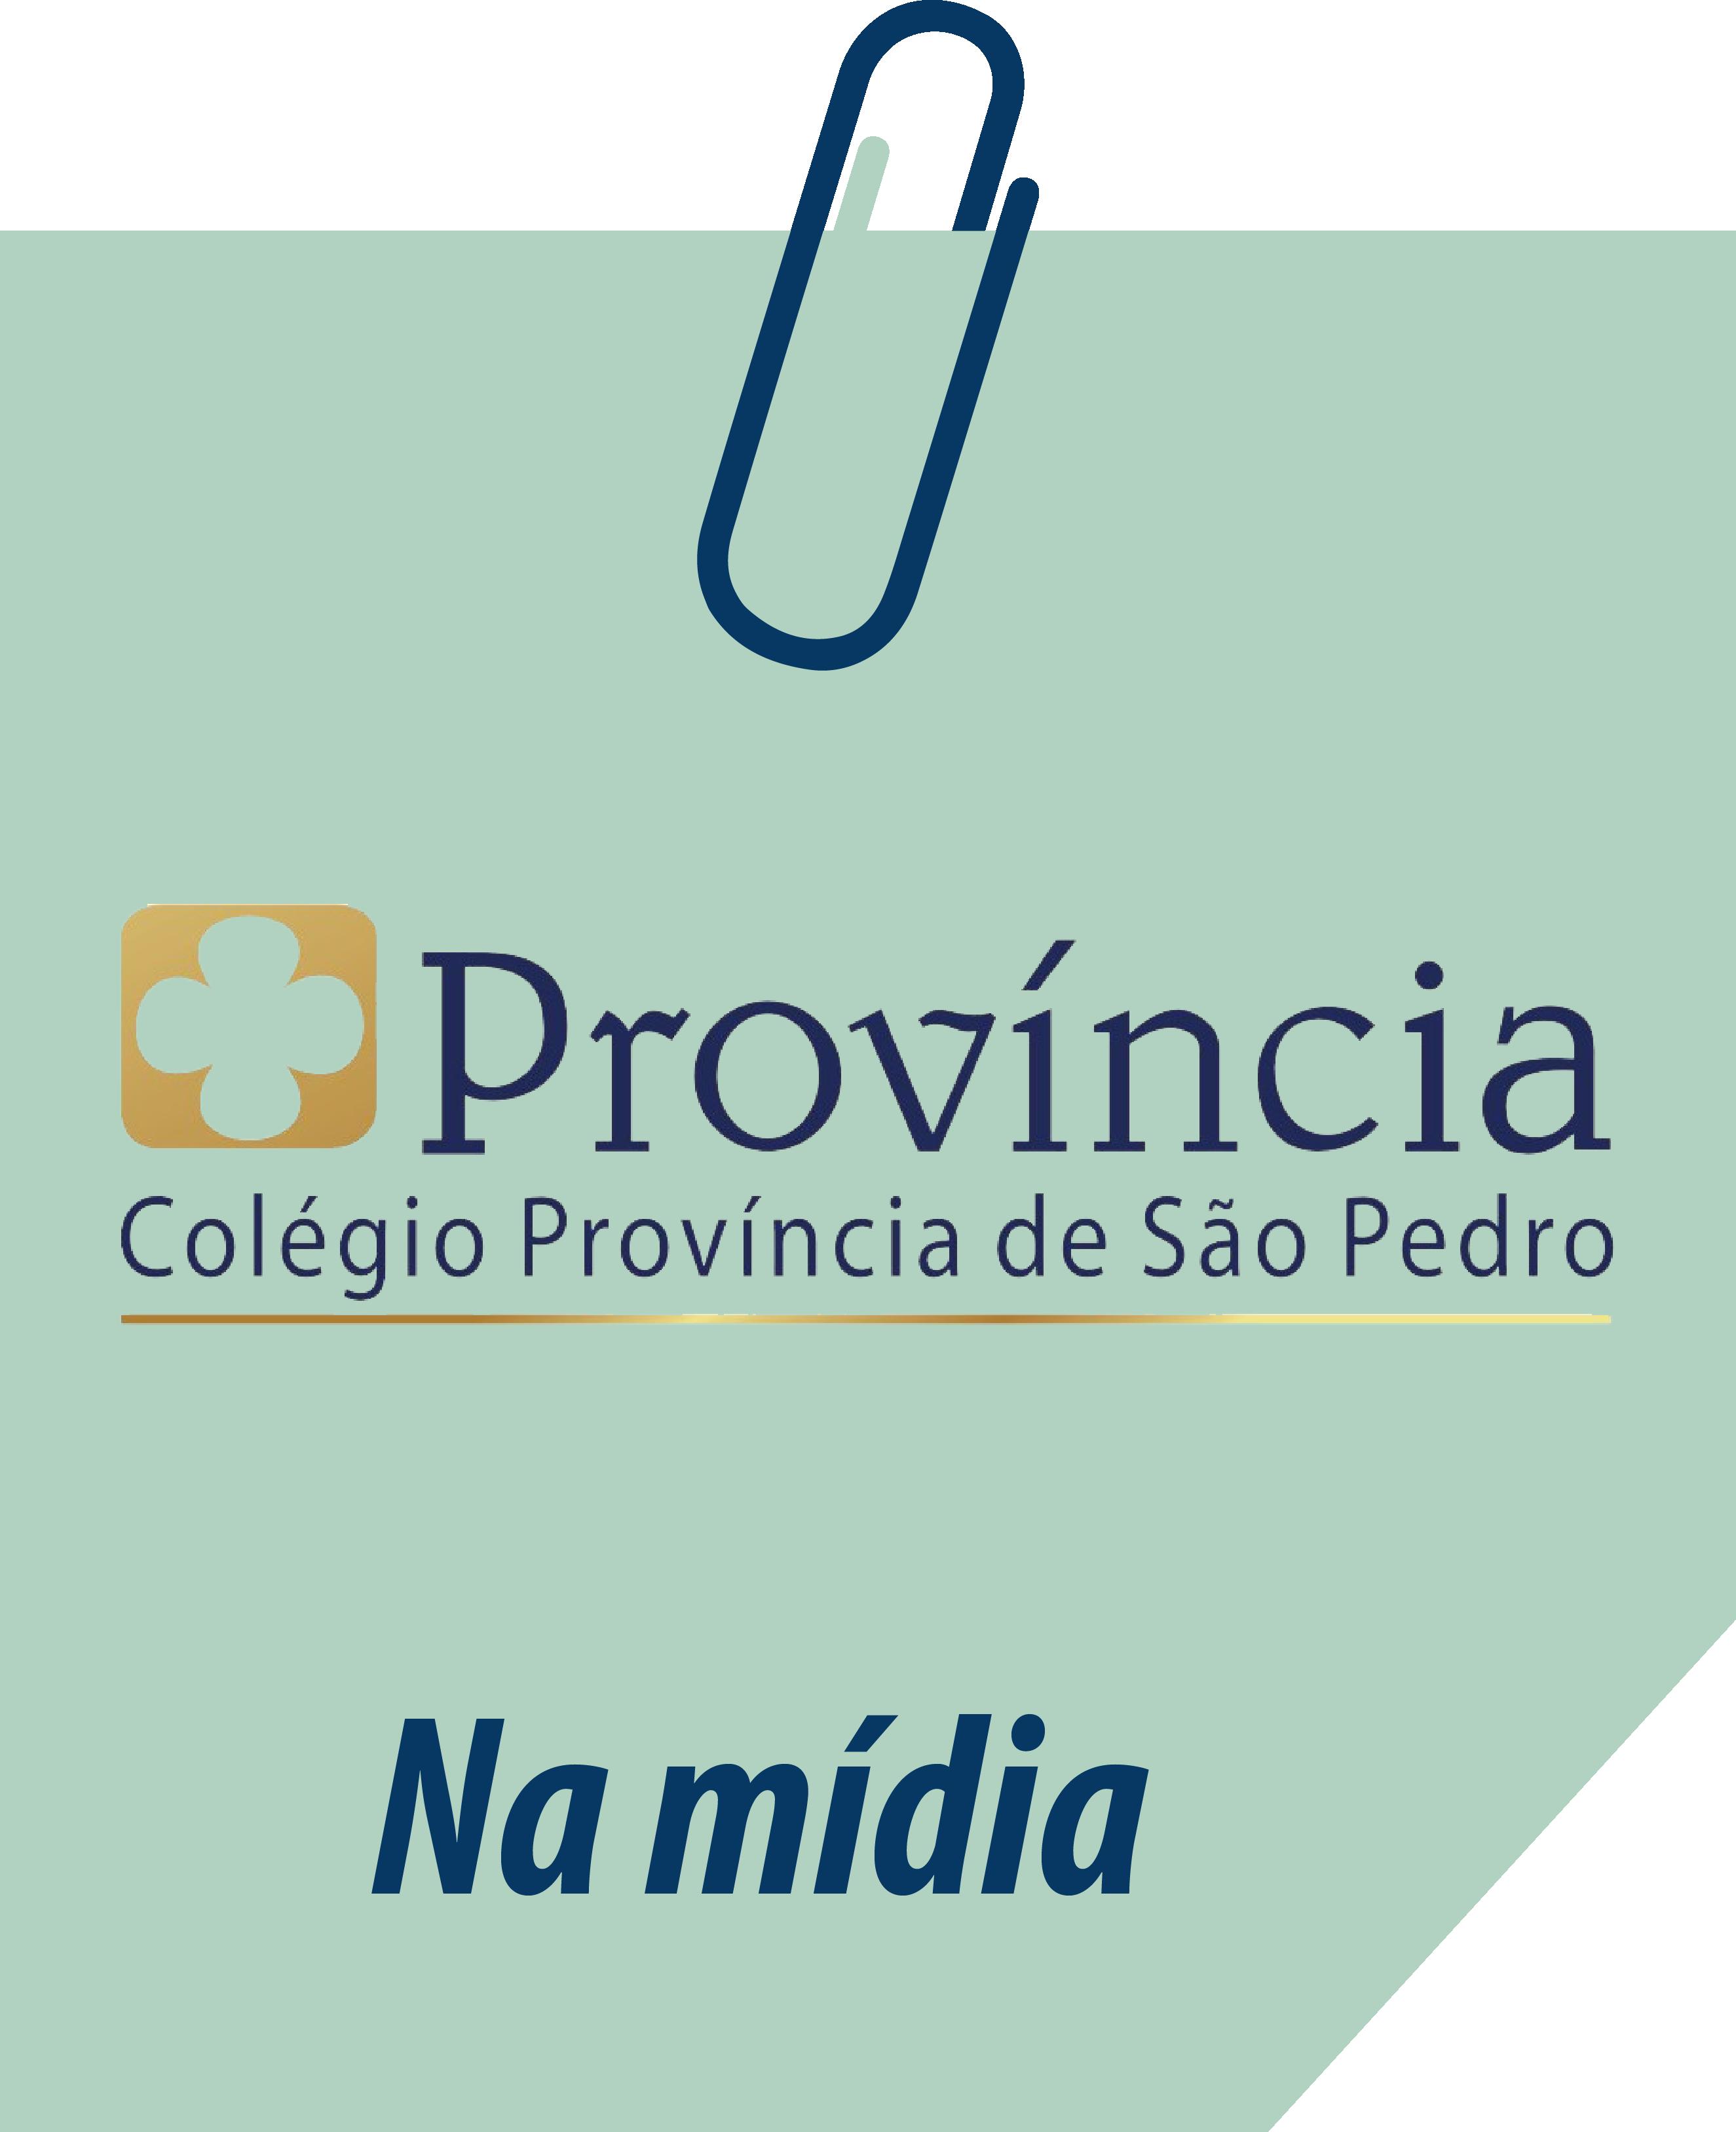 Colegio Provincia na Mídia